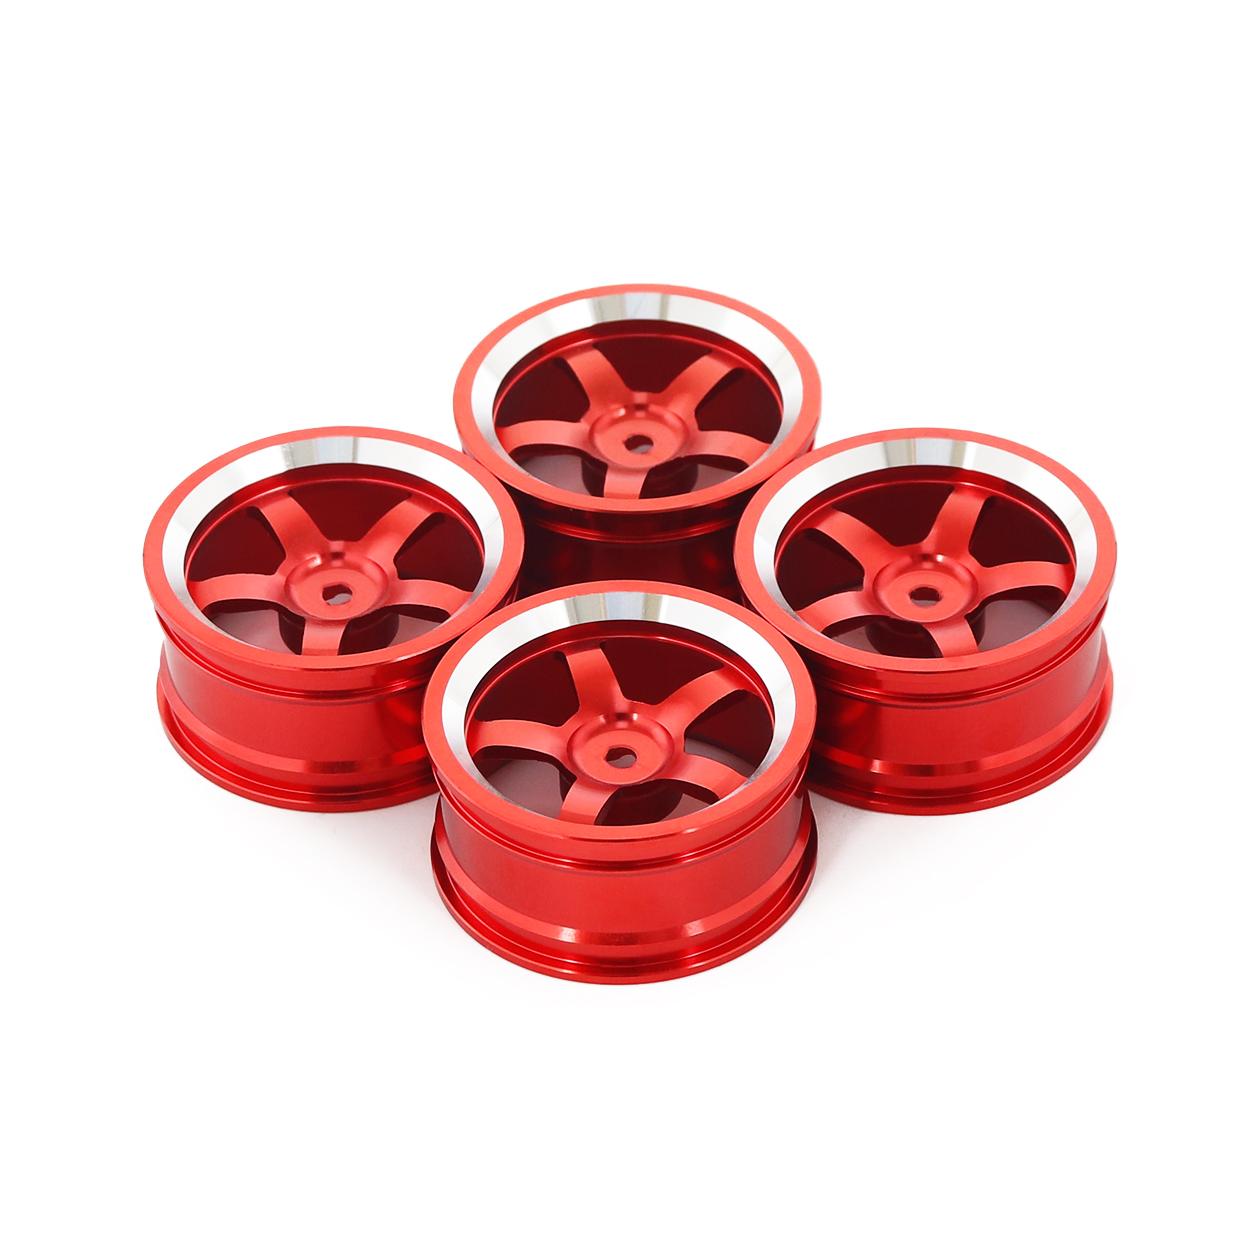 4PCS Metal Wheel Rim 1.9 Inch BEADLOCK for 1/10 RC Rock Crawler Axial SCX10 90046 AX103007 TAMIYA CC01 D90 TF2 Traxxas TRX-4 red